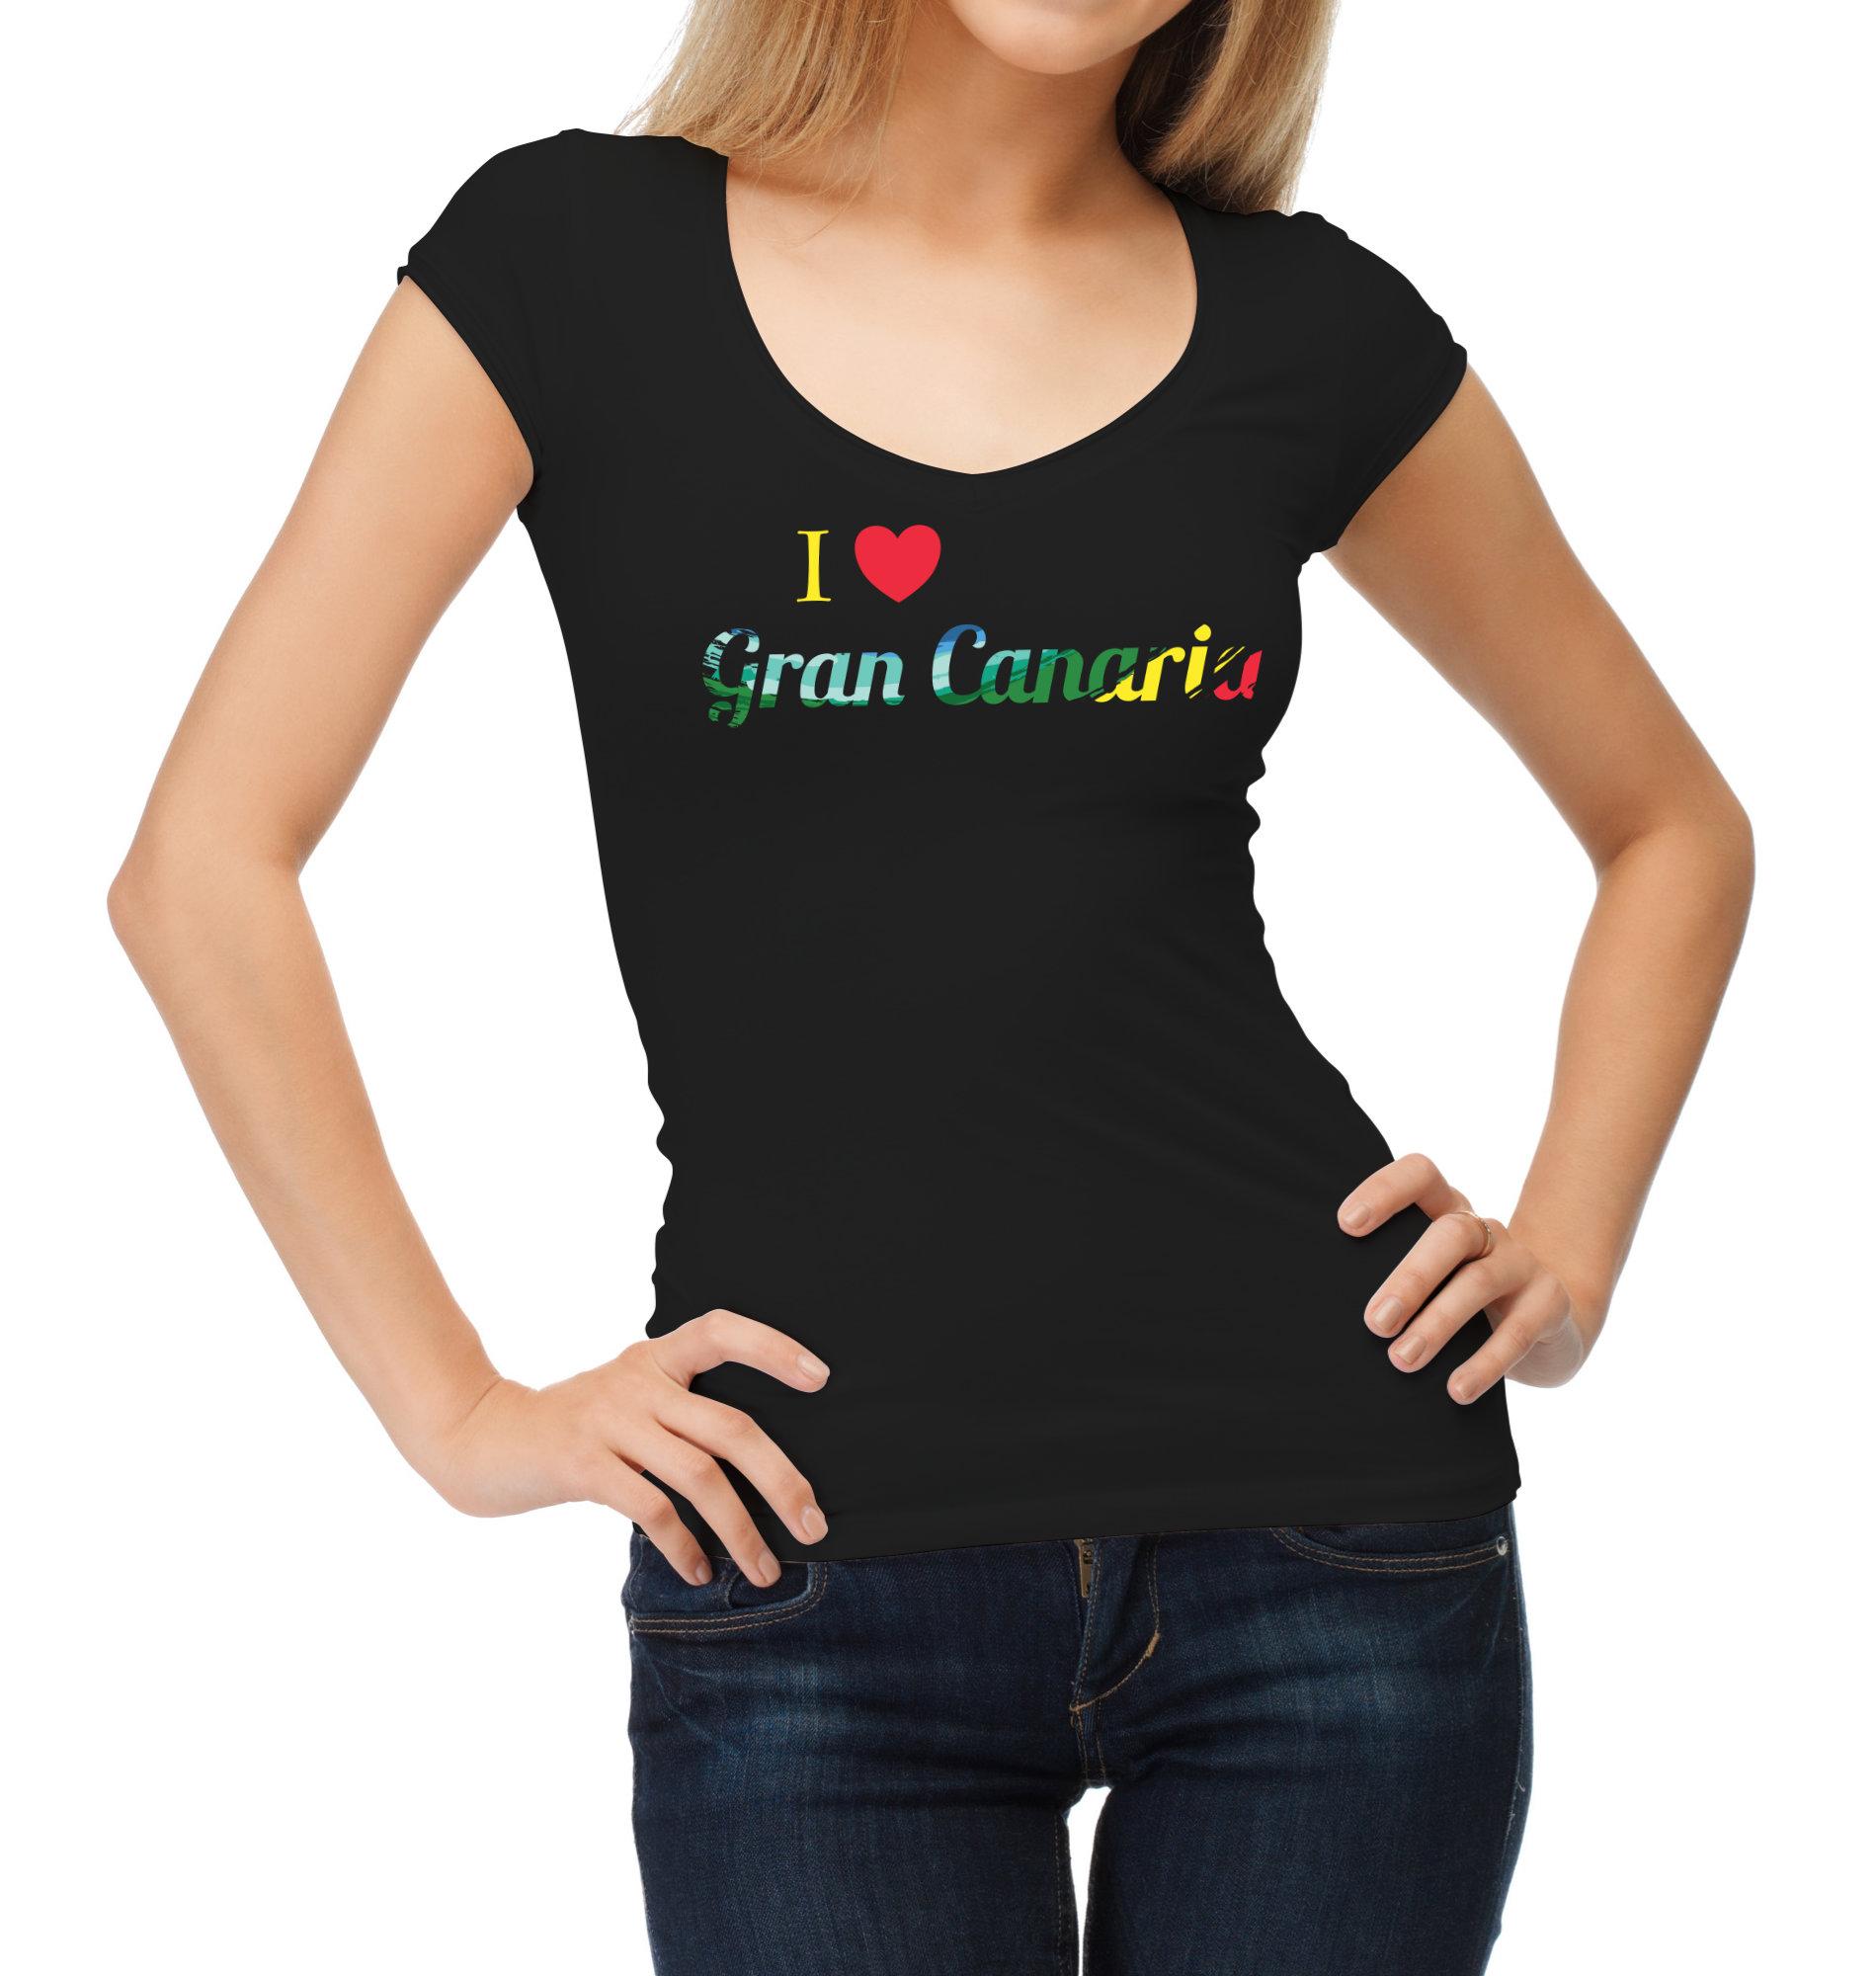 tshirt I love Gran Canaria